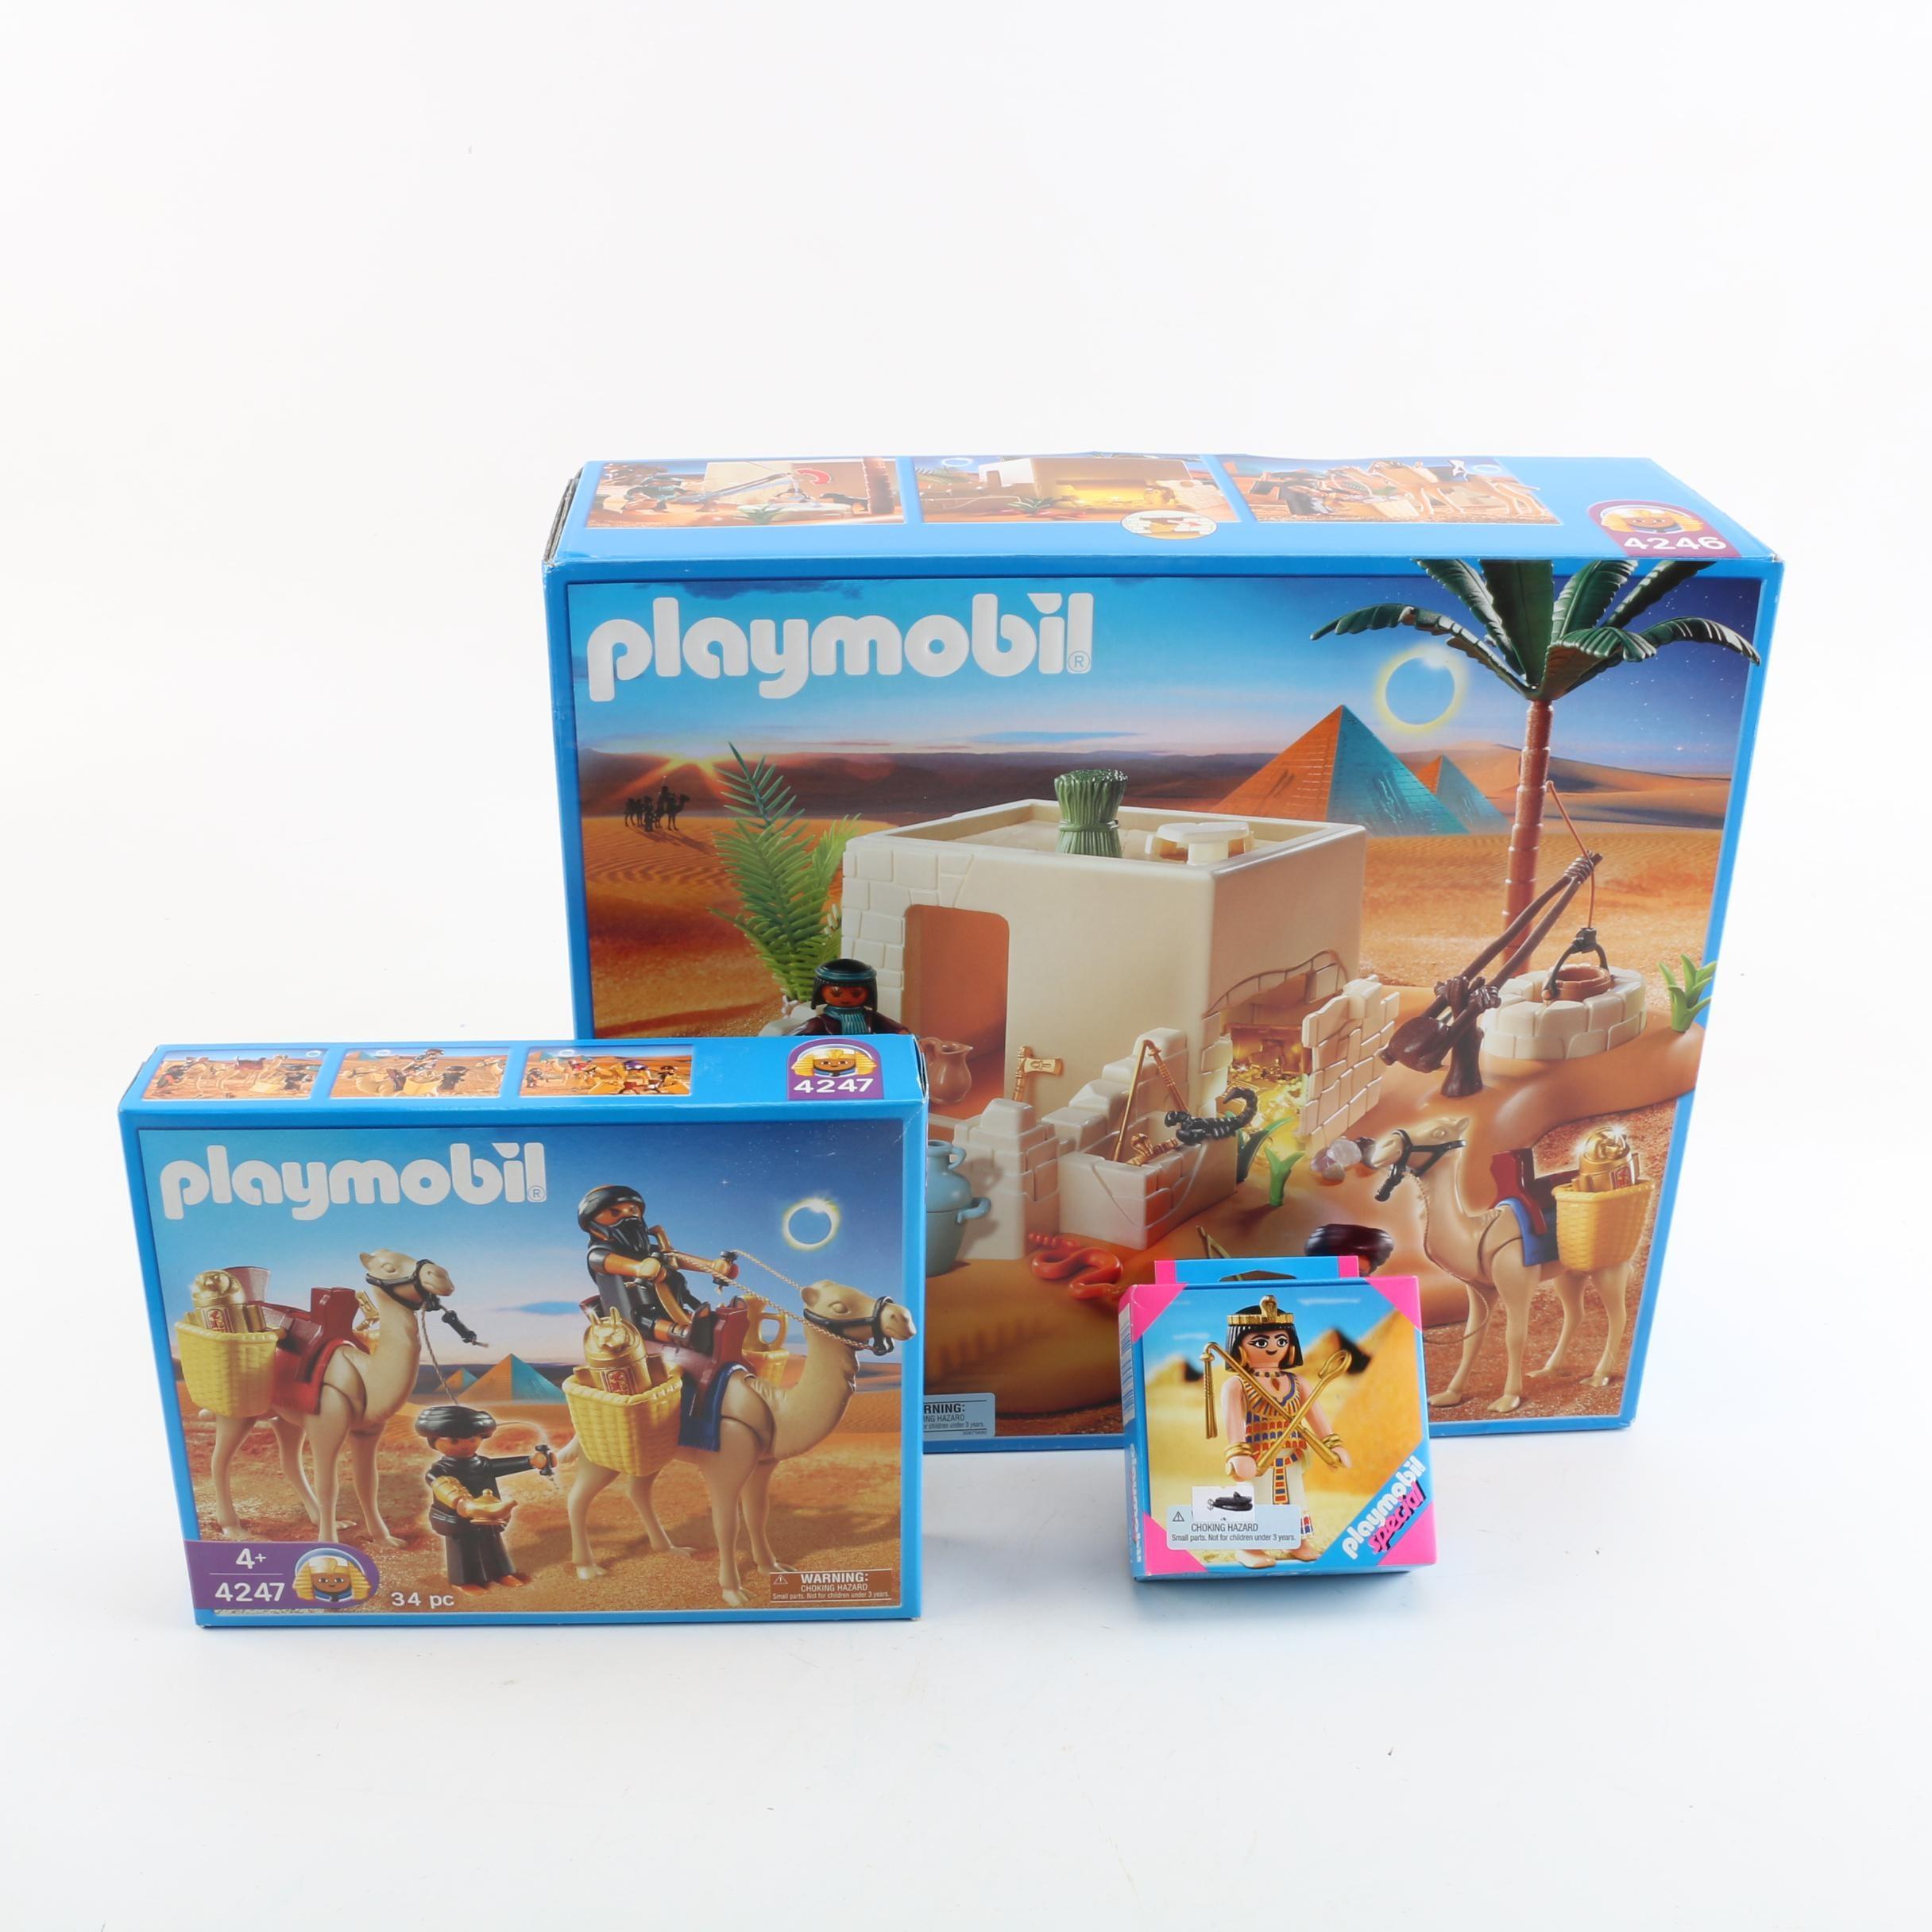 Playmobil Egyptian Themed Play Sets